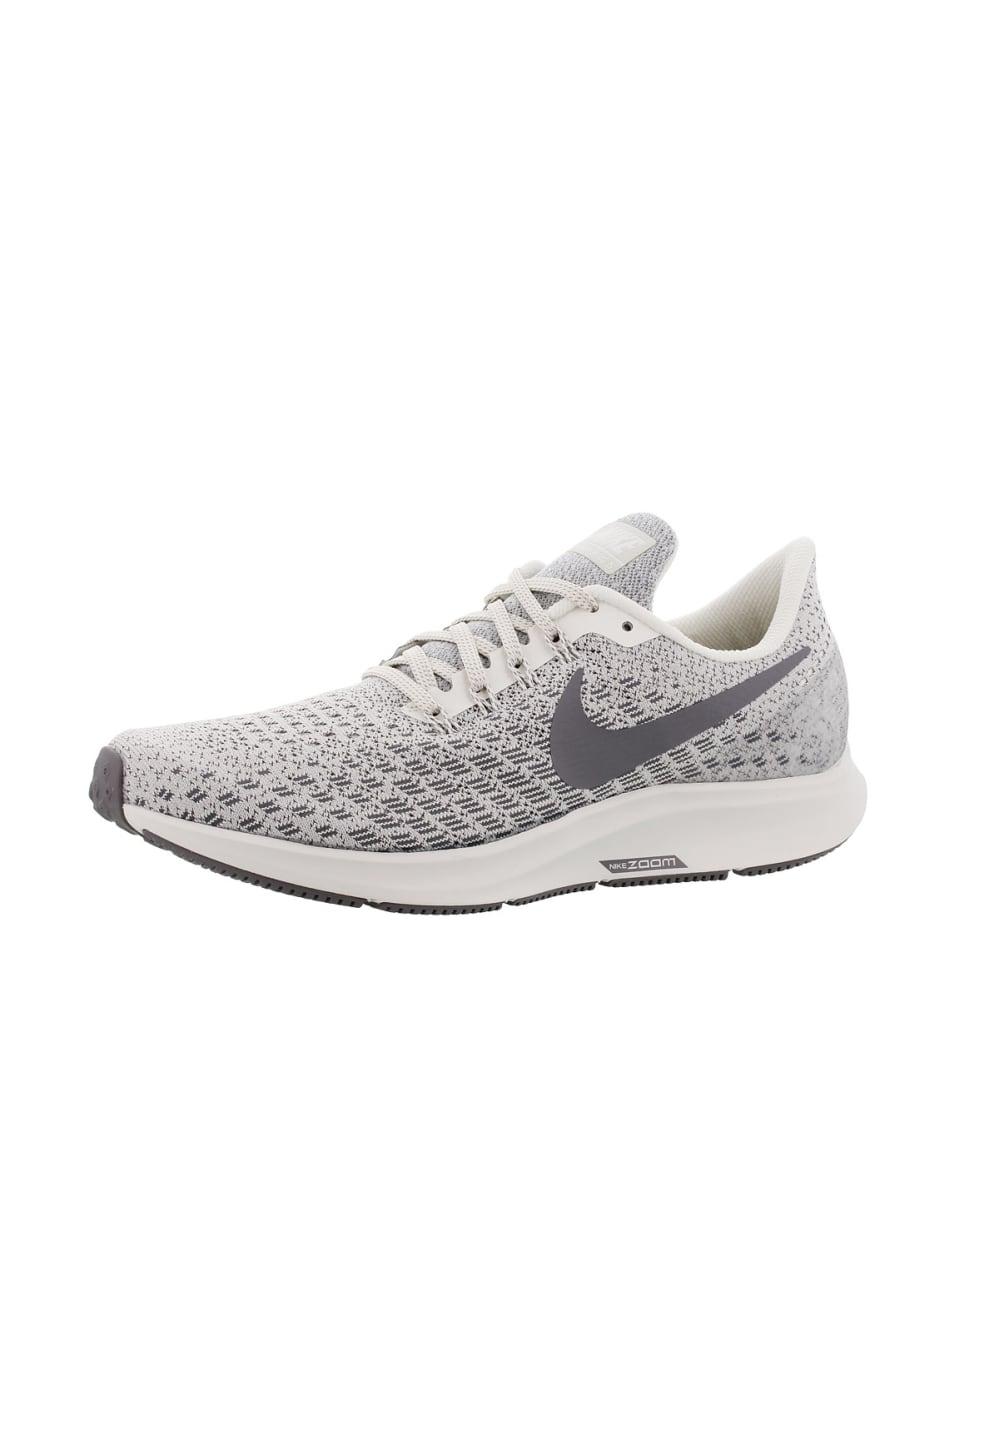 hot sale online af451 8bfa3 Next. -60%. Nike. Air Zoom Pegasus 35 - Chaussures running pour Femme